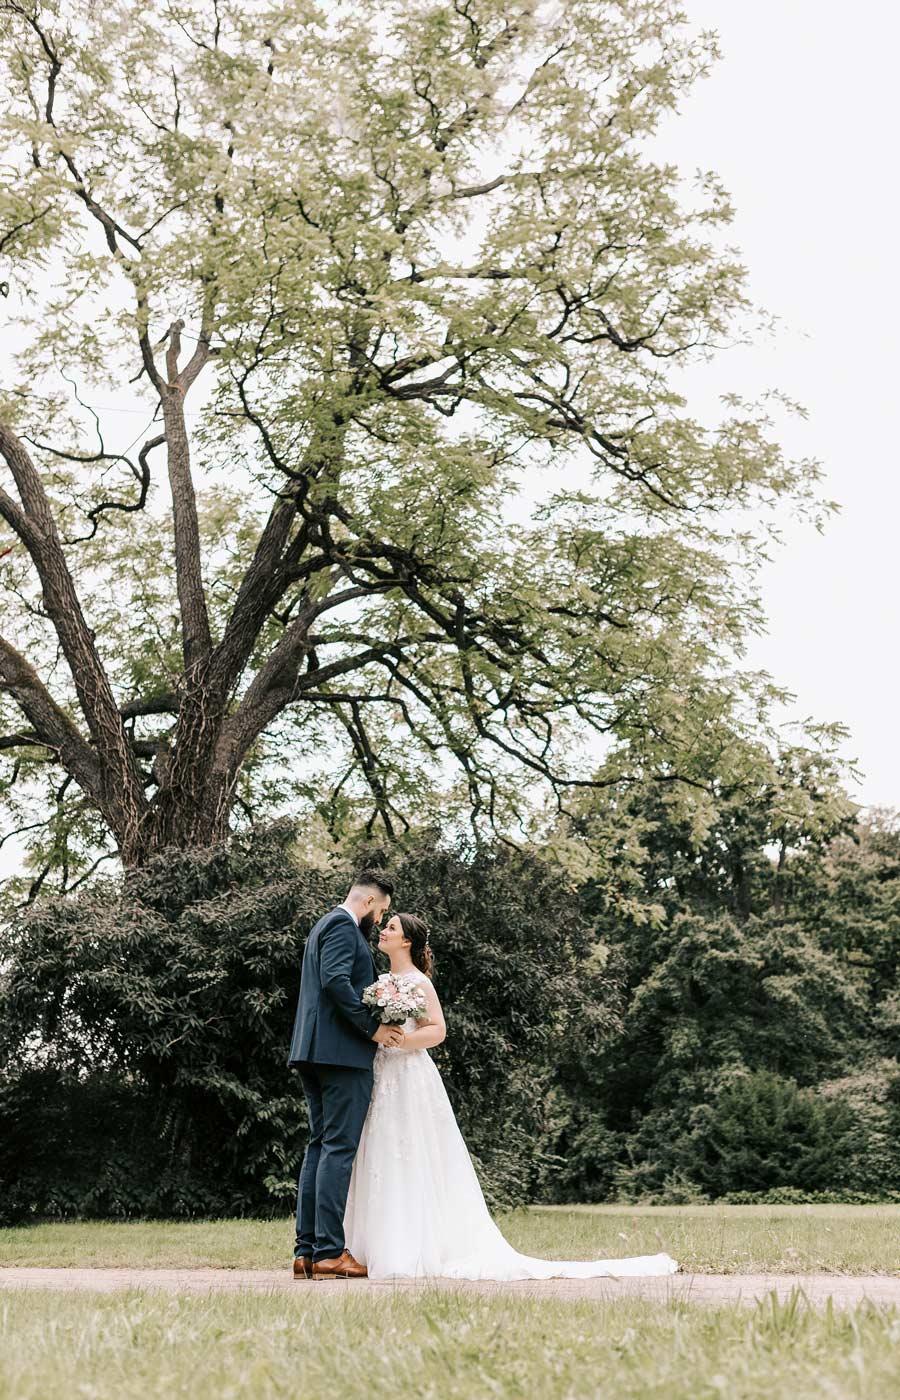 Studioart-Photography-Hochzeitsshooting Oktober-3